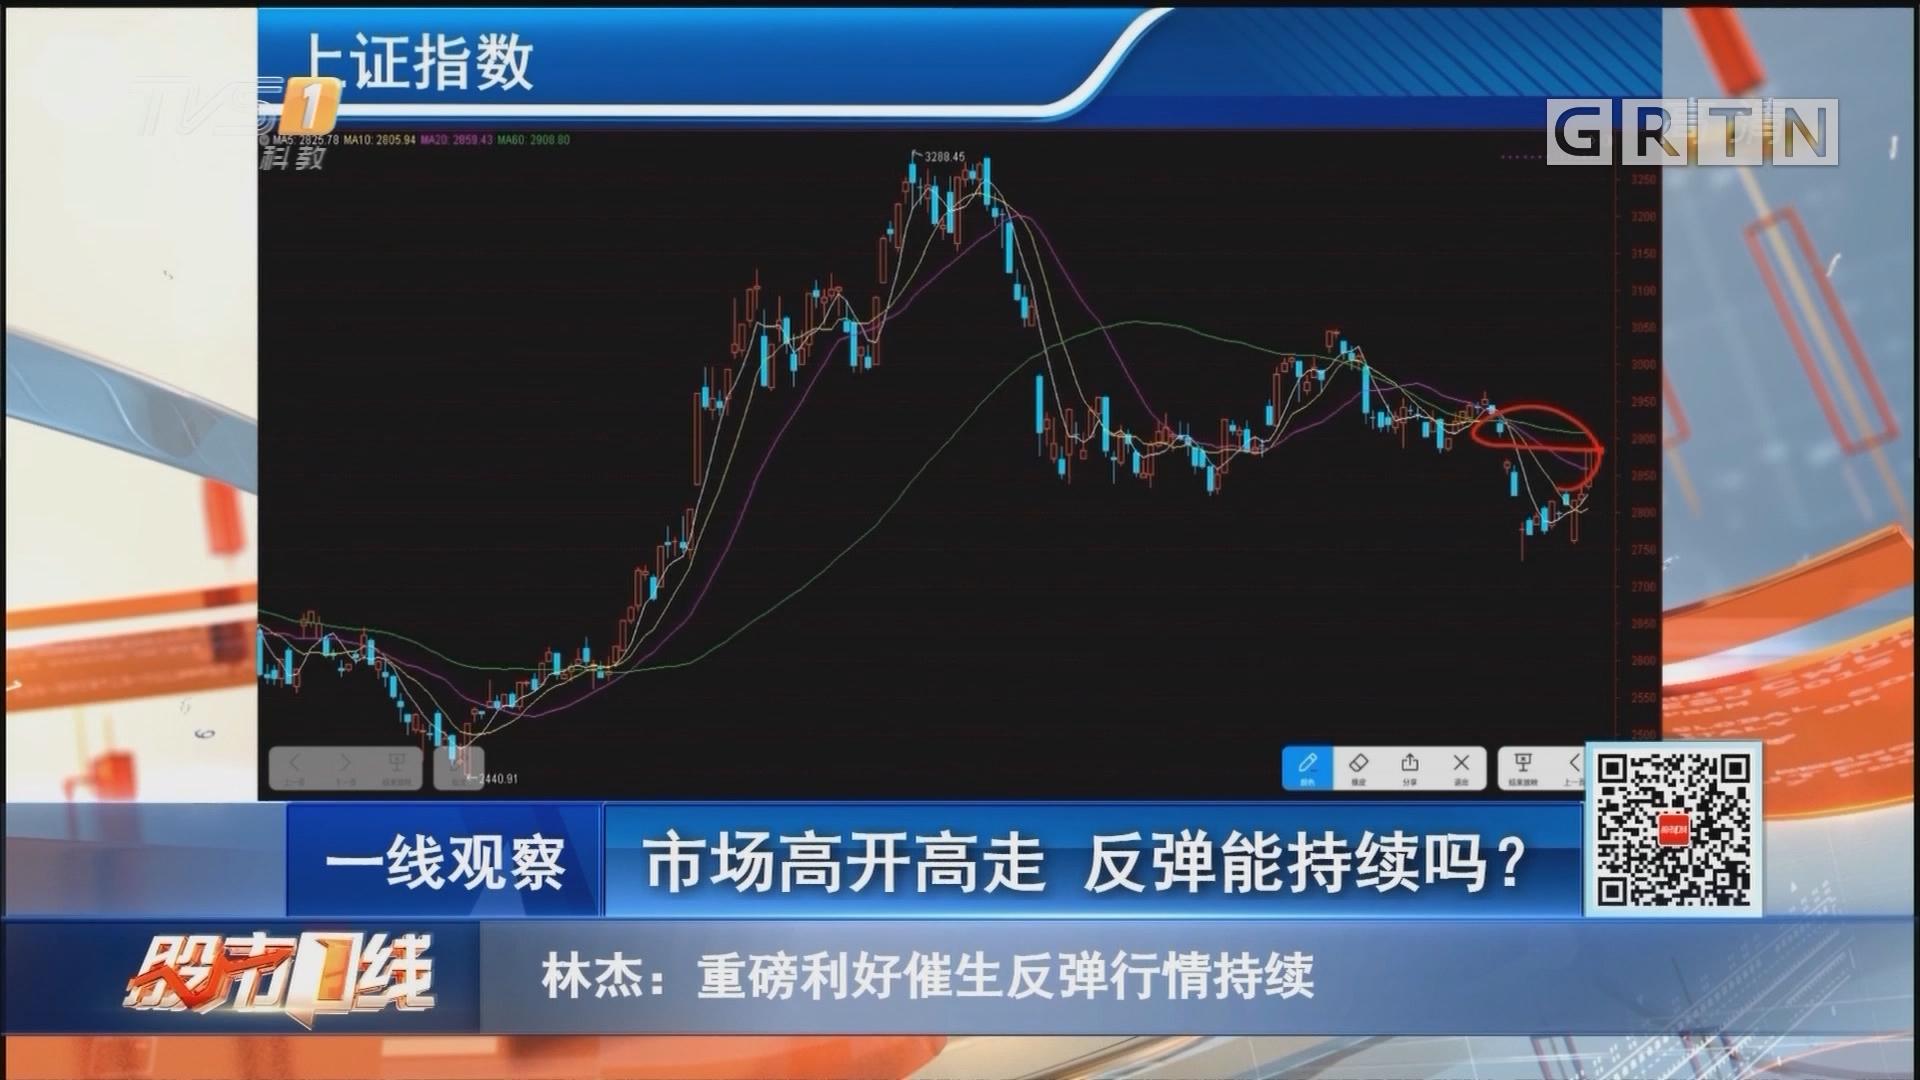 [HD][2019-08-19]股市一线:市场高开高走 反弹能持续吗?